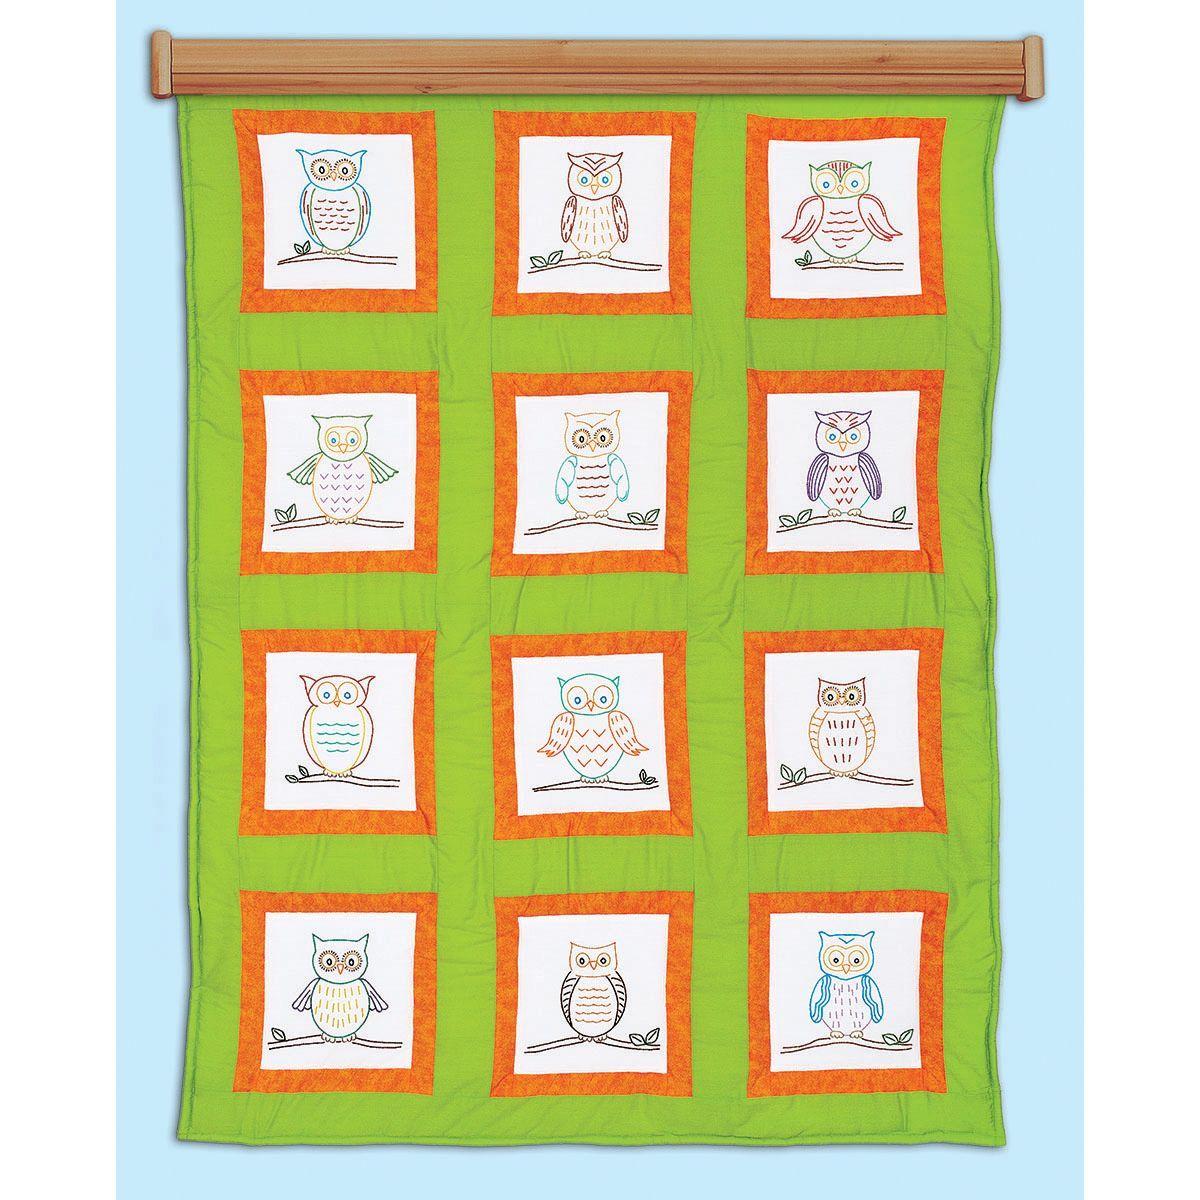 Jack dempsey themed stamped quilt blocks 9x9 12pkg owls new quilt patterns owls prestamped quilt blocks bankloansurffo Image collections